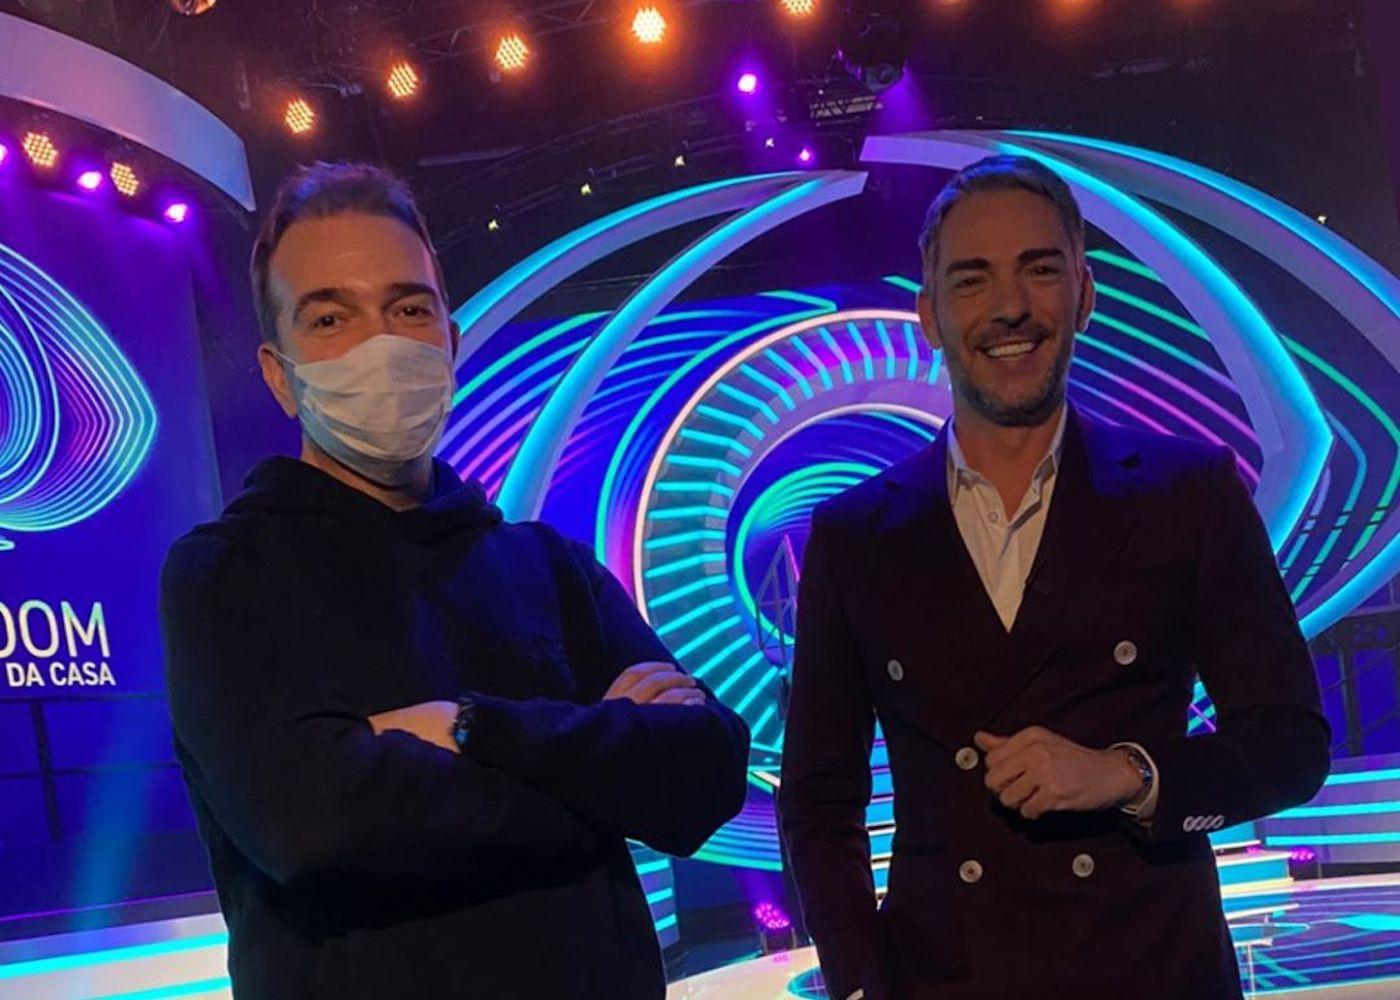 Nuno Santos Claudio Ramos Nuno Santos Explica A Razão Da Voz Da 'Casa Dos Segredos' Estar No 'Big Brother'